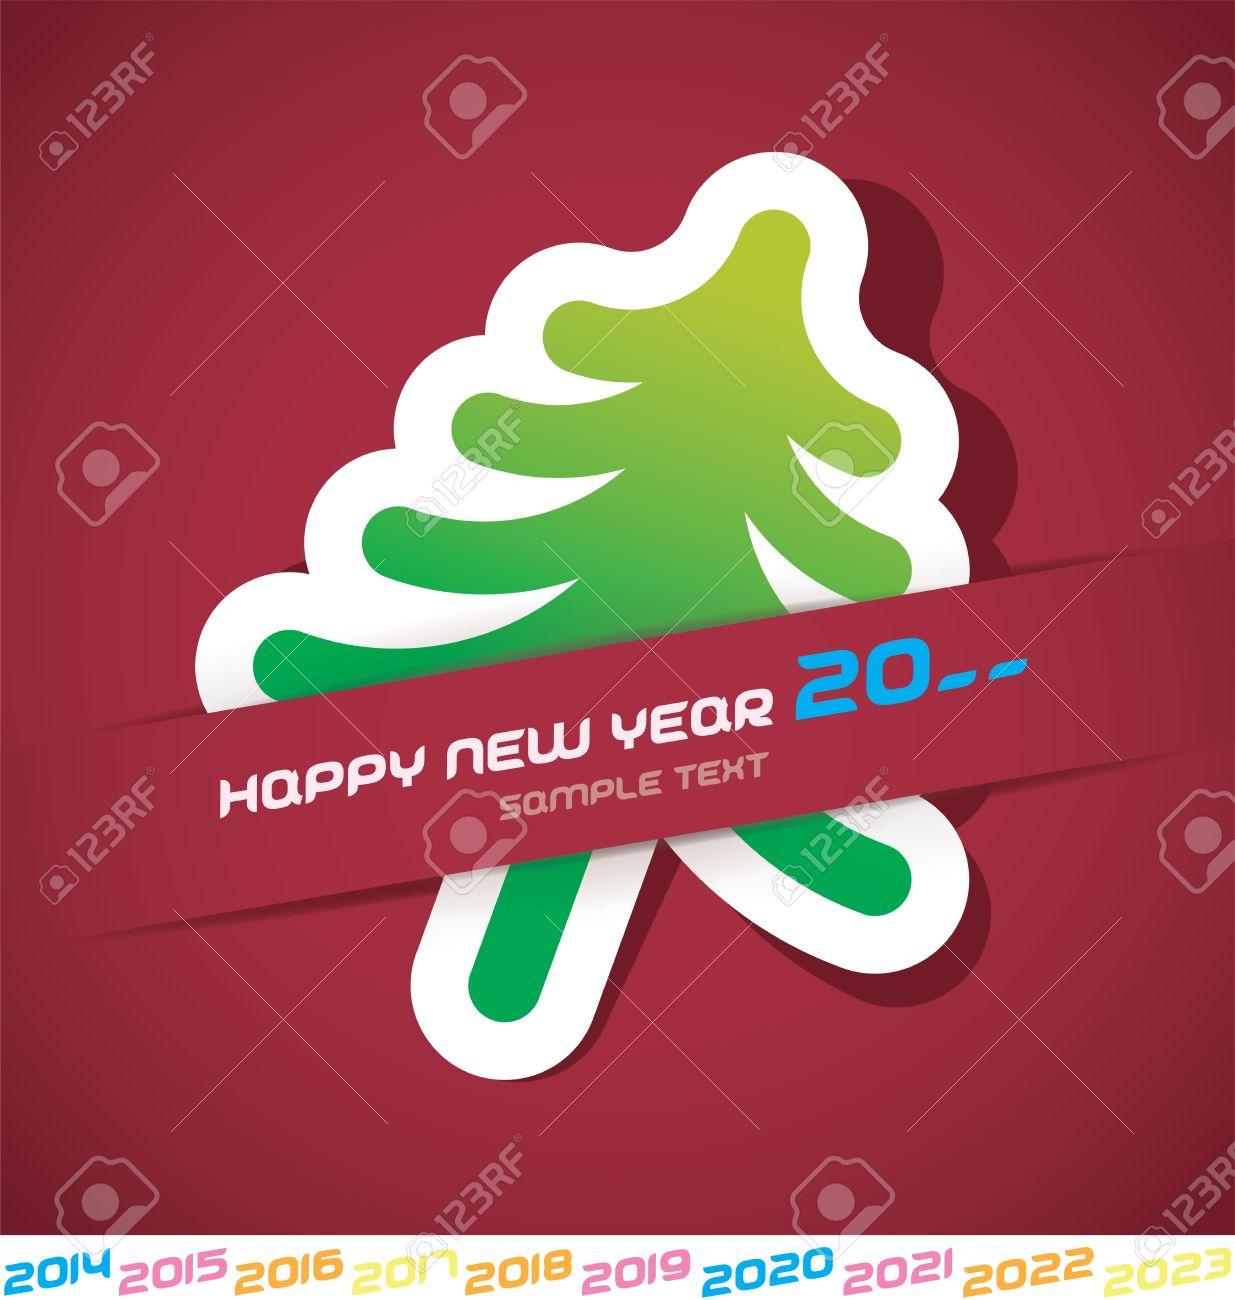 Marry Christmas 2020 2022 Modern Merry Christmas, New Year 2014, 2015, 2016, 2017, 2018